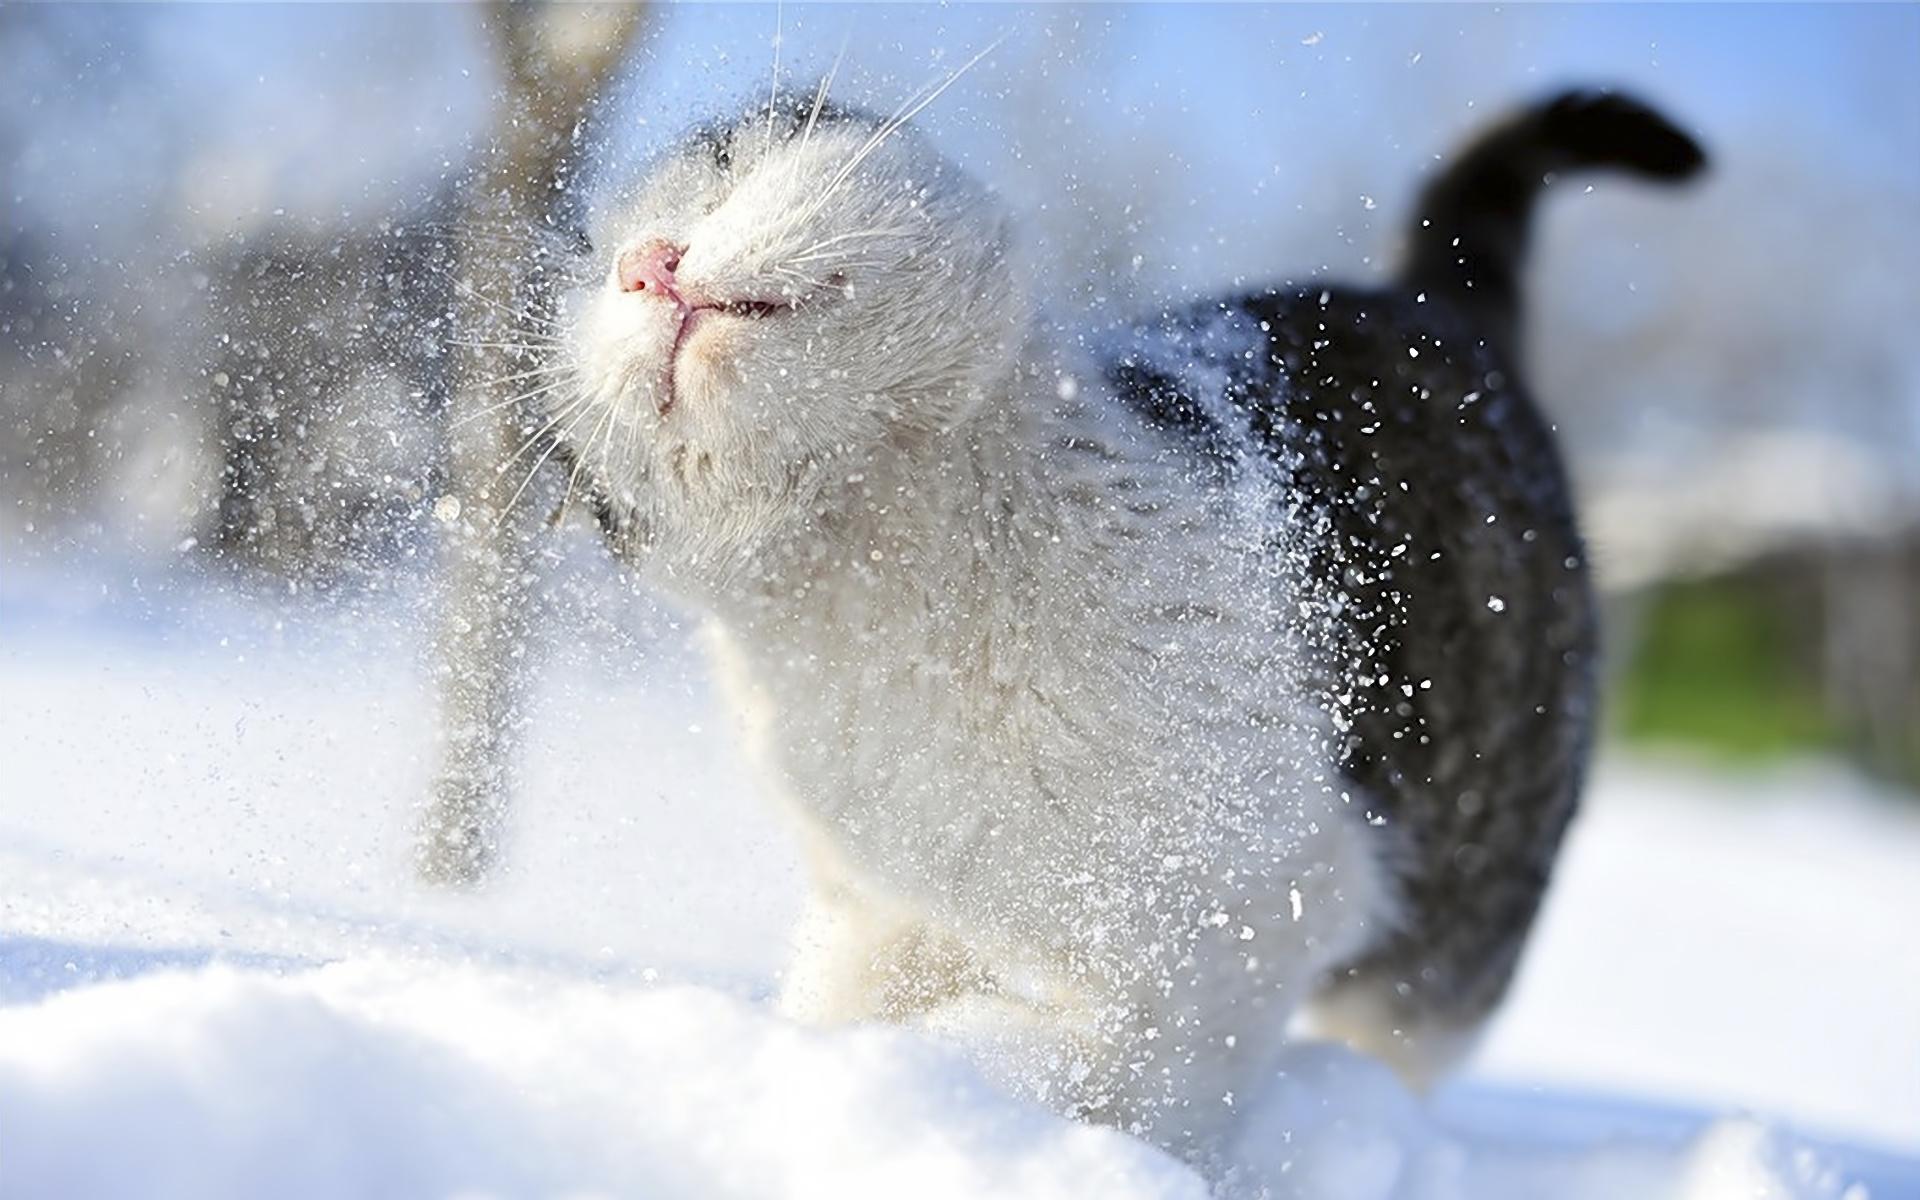 Tiere - Katze  Wallpaper